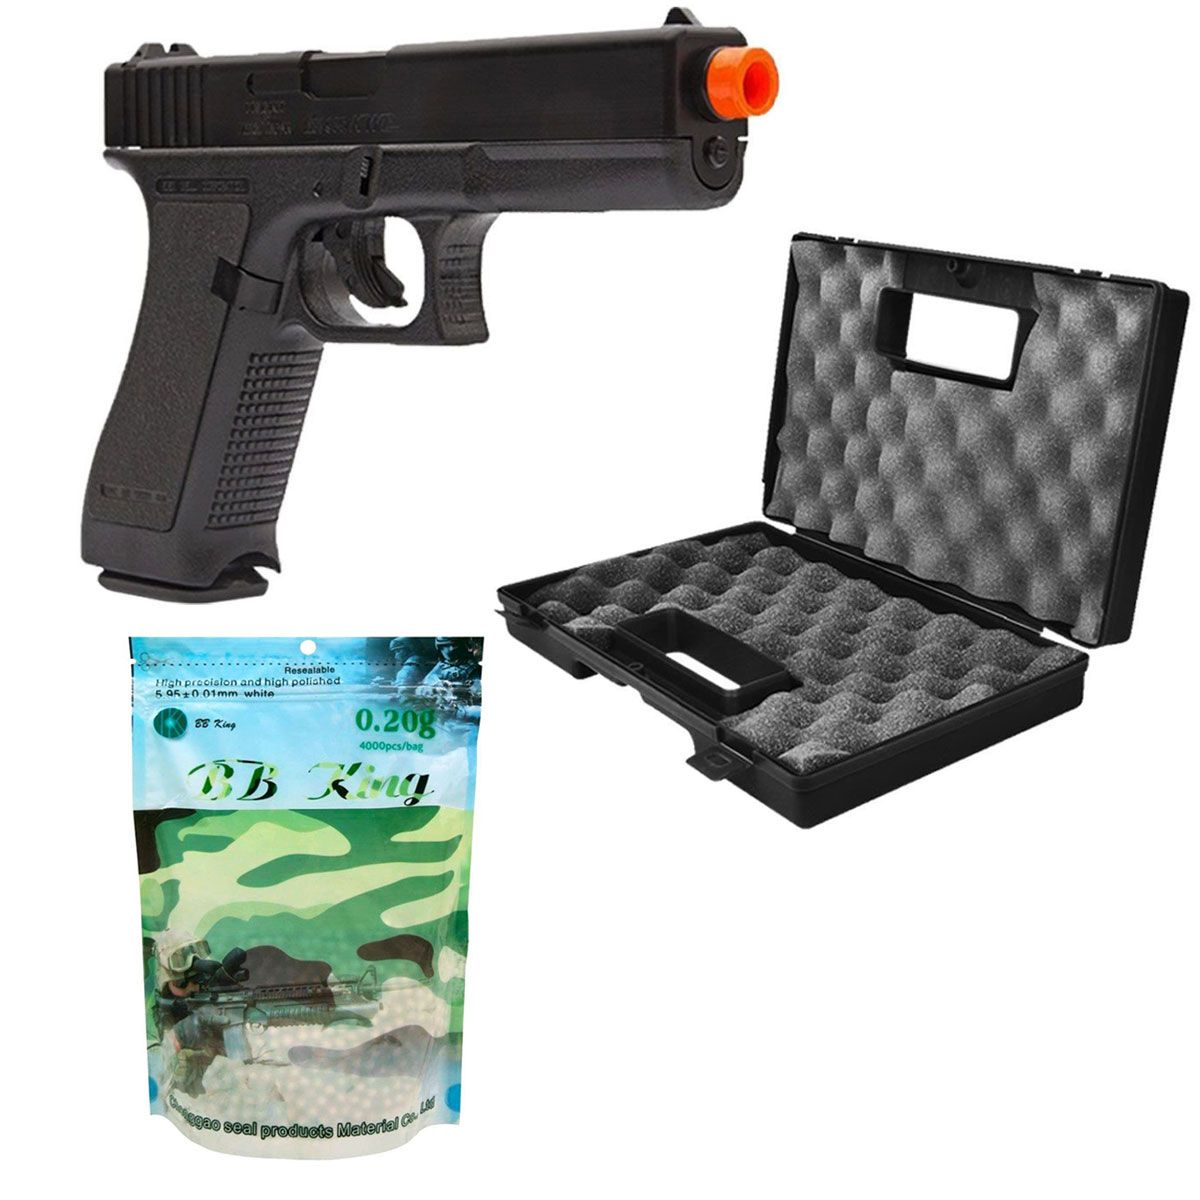 Kit Pistola Glock G7 Maleta + BB King 0,20g